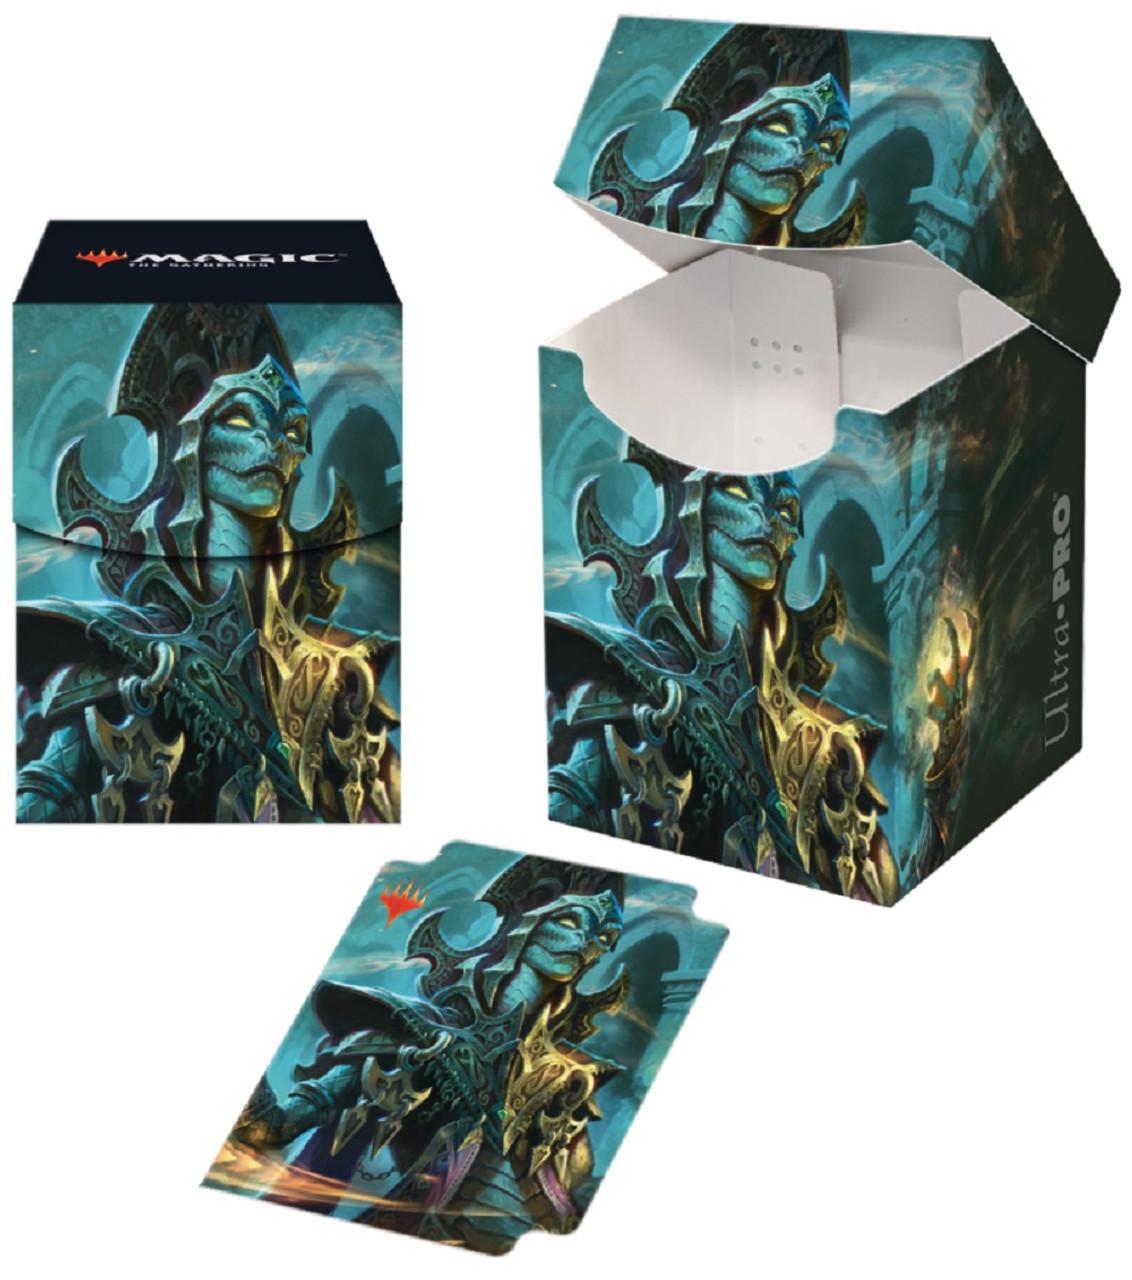 Magic: The Gathering - Commander 2019 V2 PRO 100+ Deck Box - Special Order